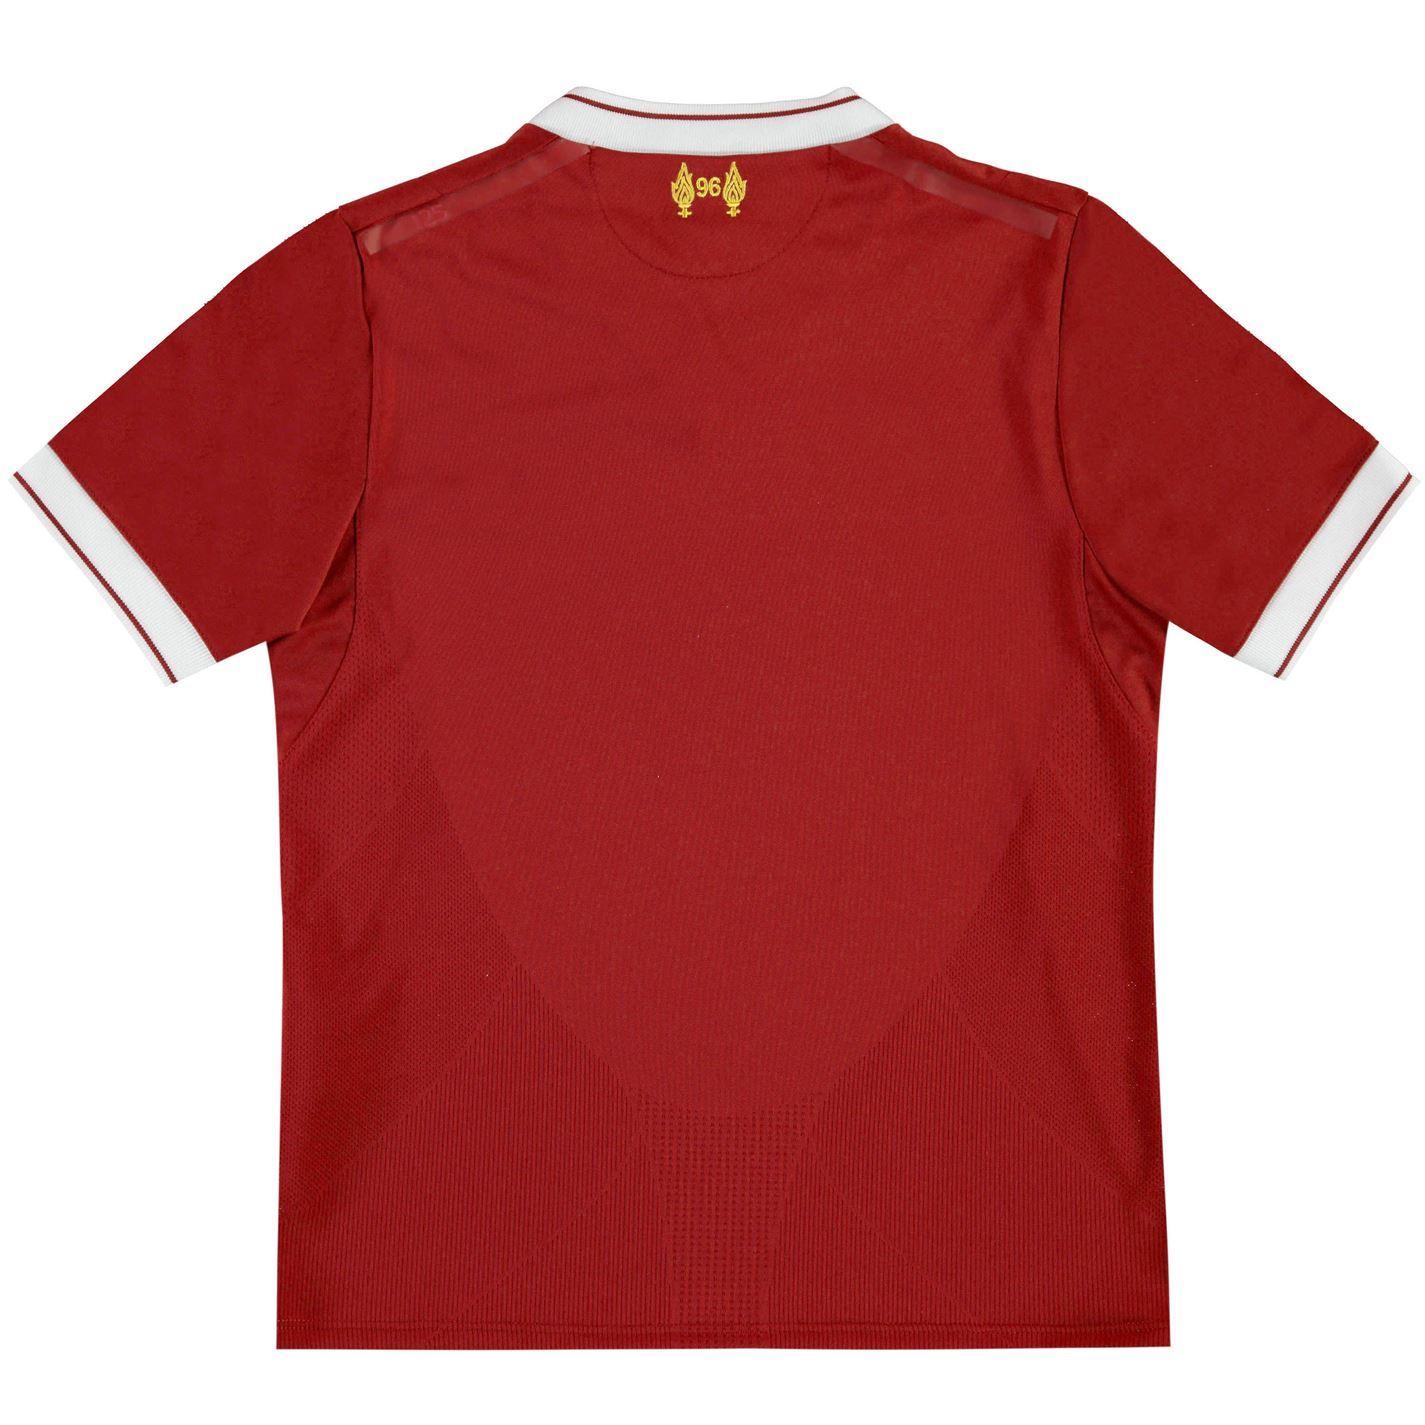 hot sale online 6cd08 3af62 Details about New Balance Liverpool Home Jersey 2017 2018 Juniors Red  Football Soccer Shirt